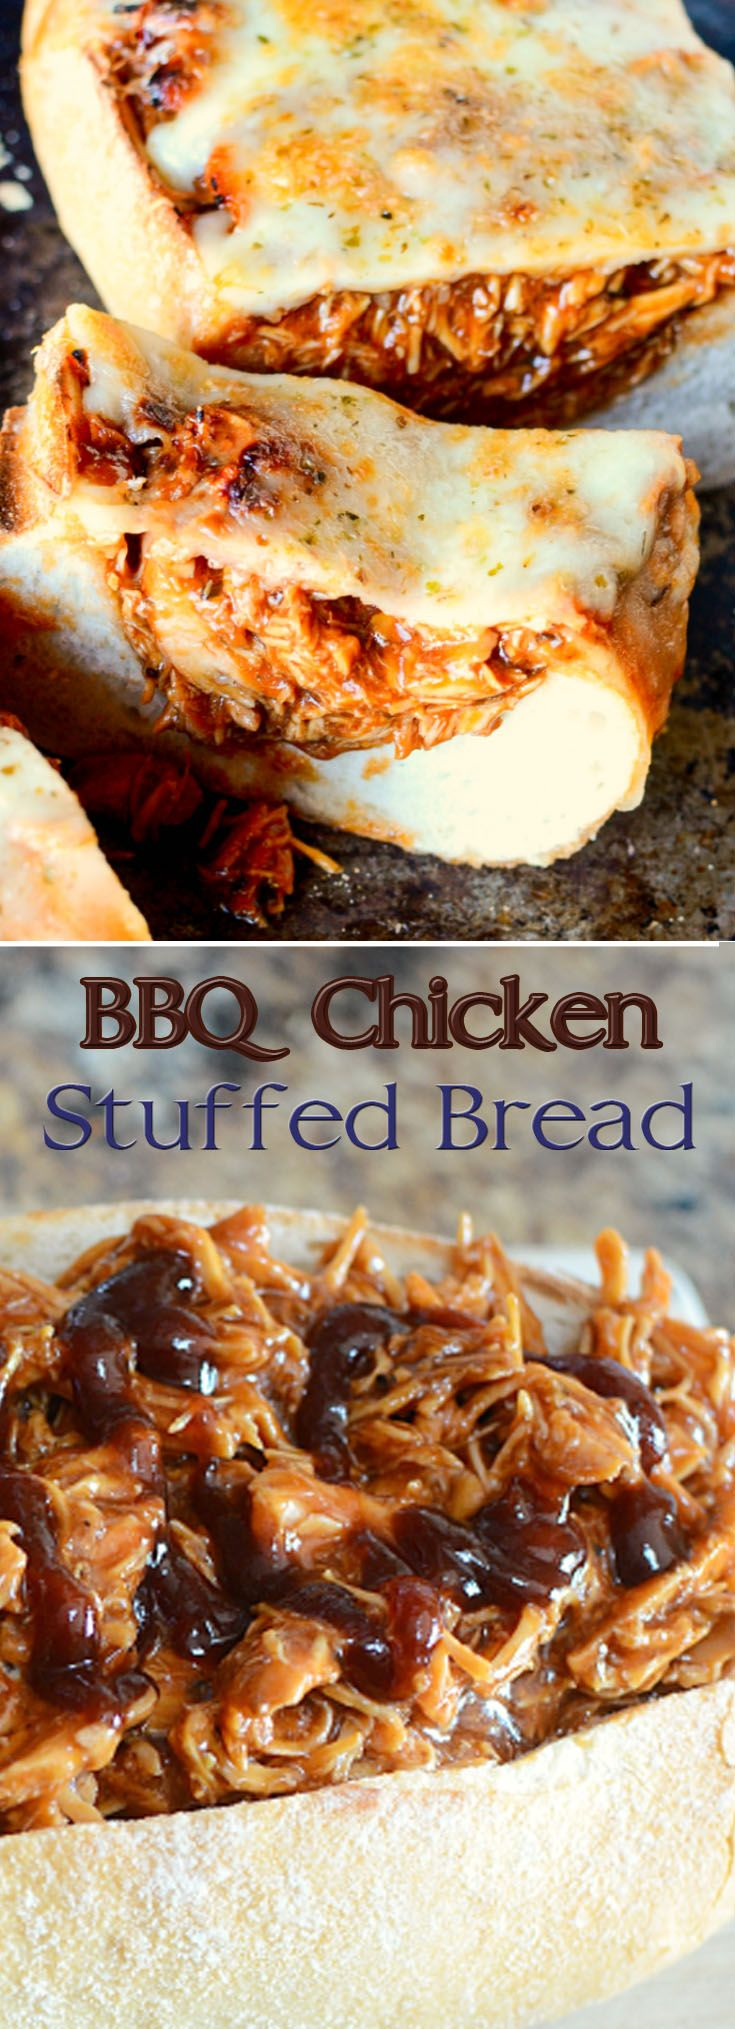 BBQ Chicken Stuffed Bread